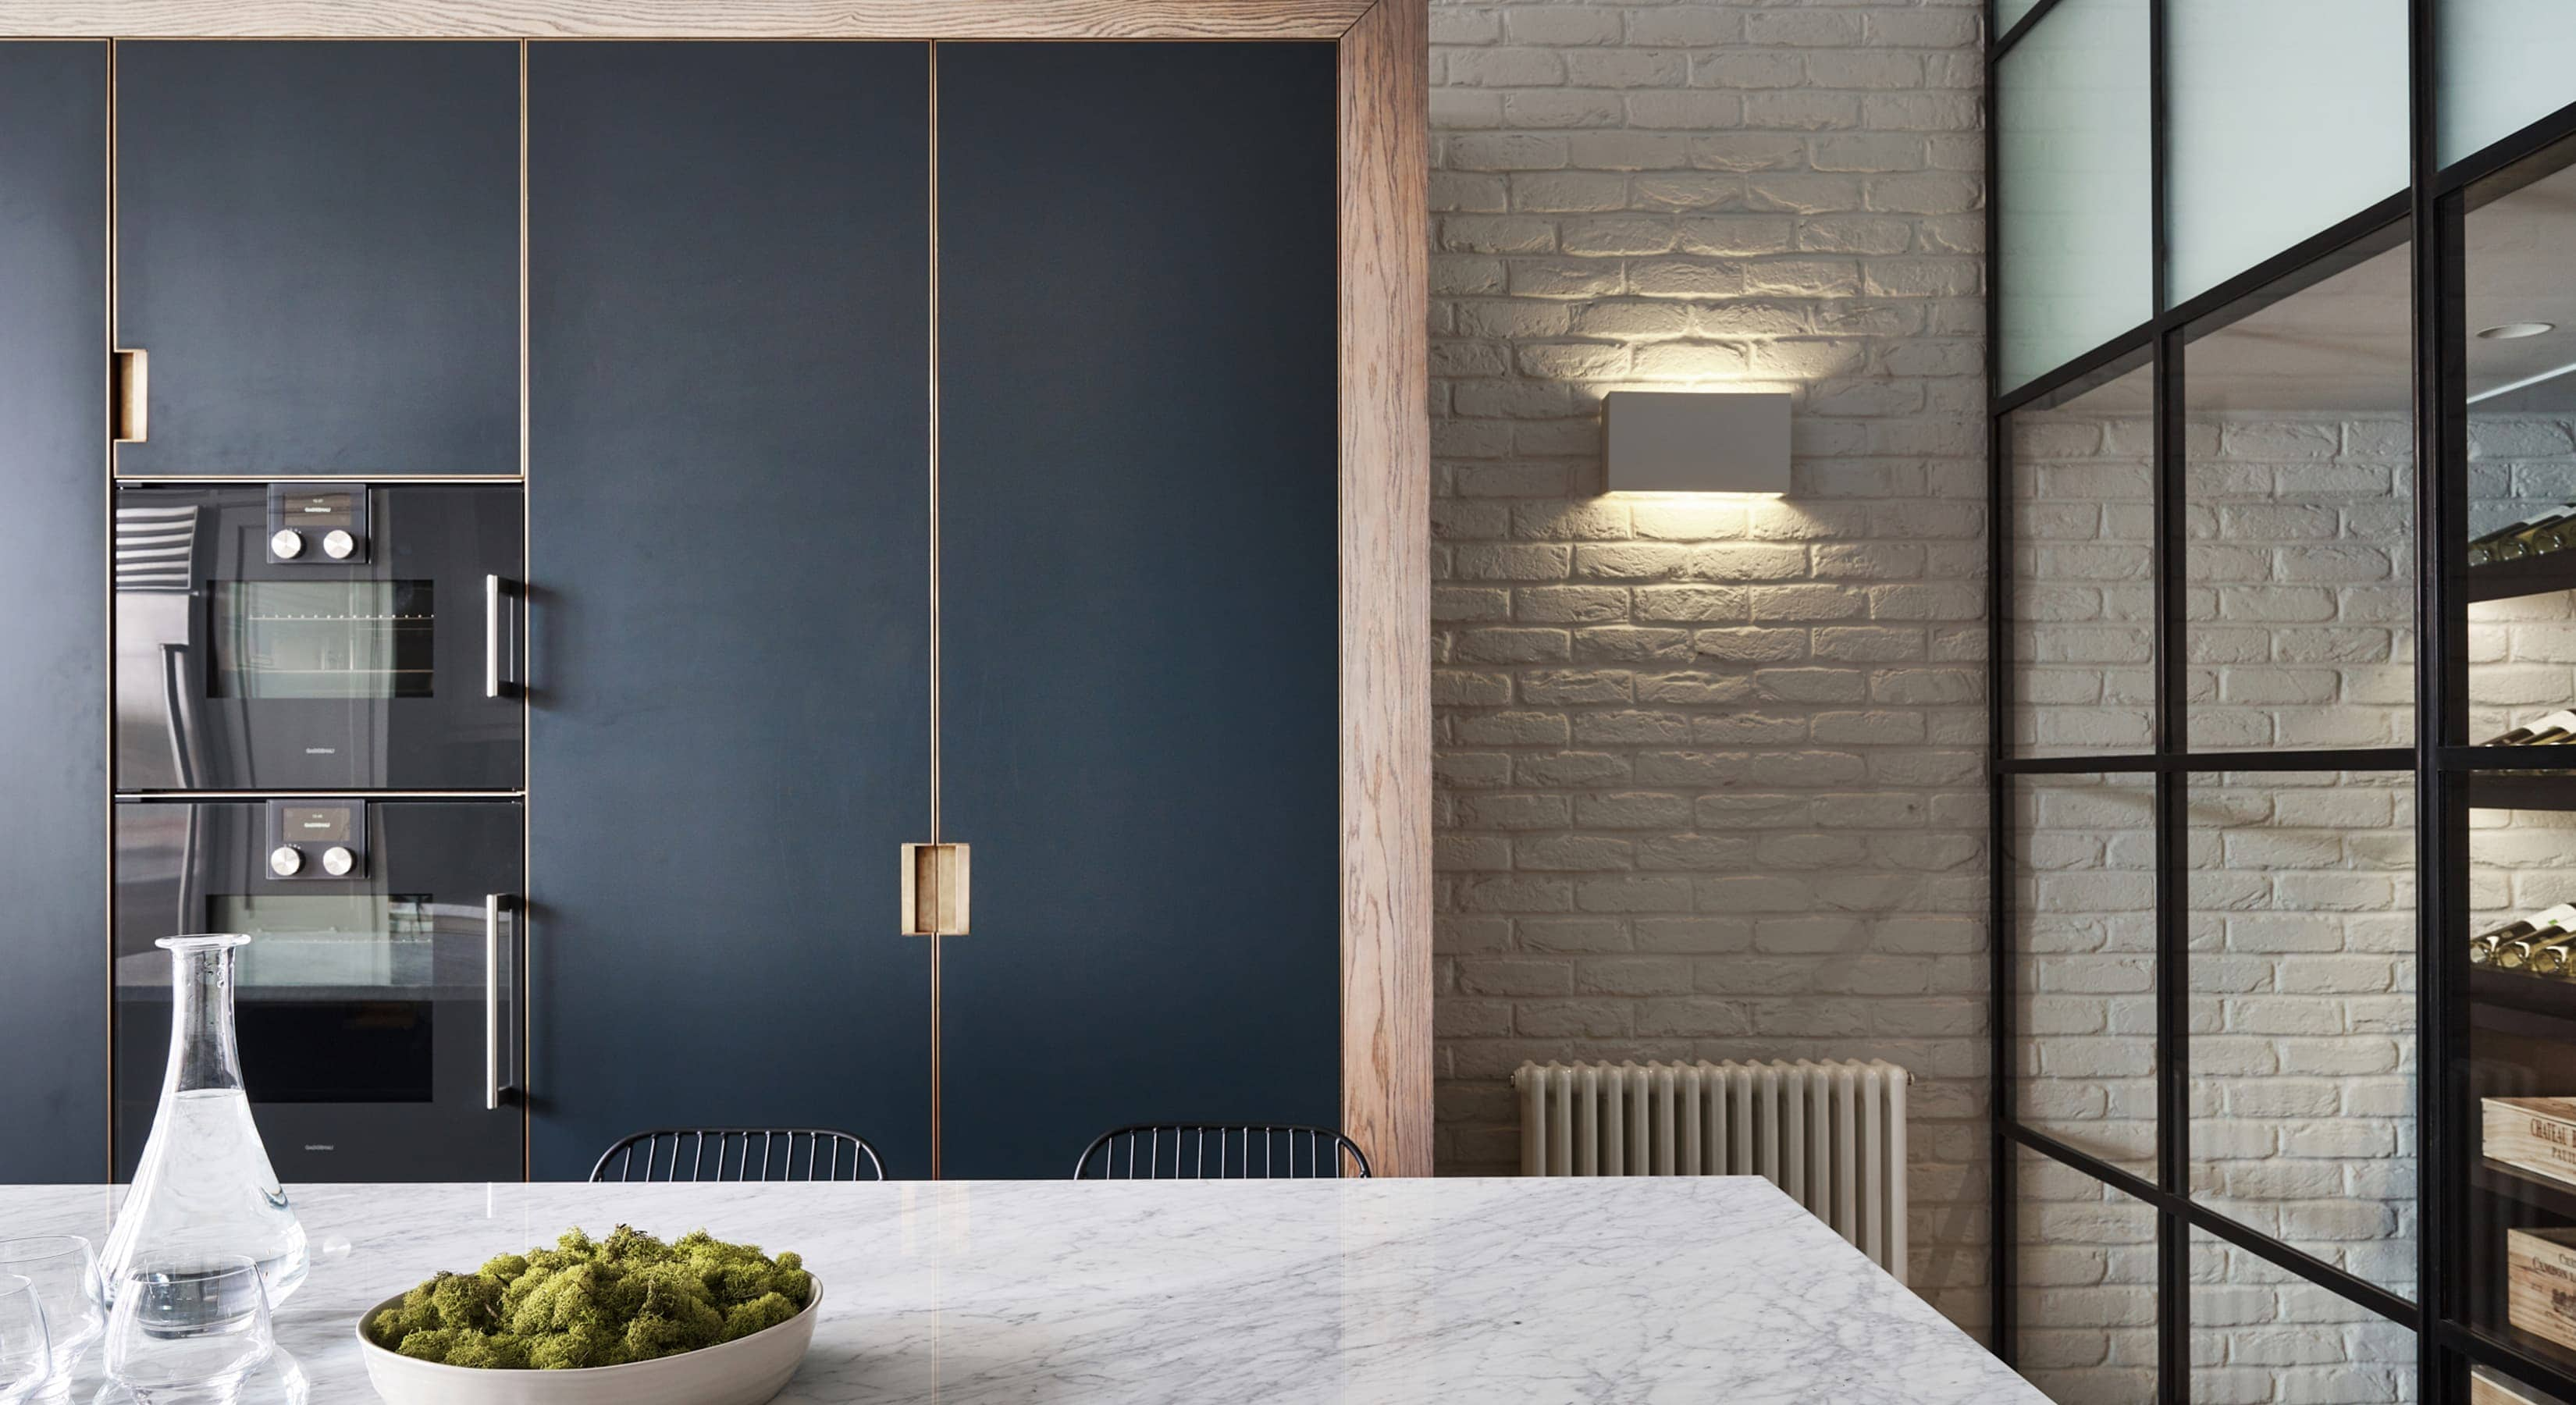 Broseley kitchen island concept